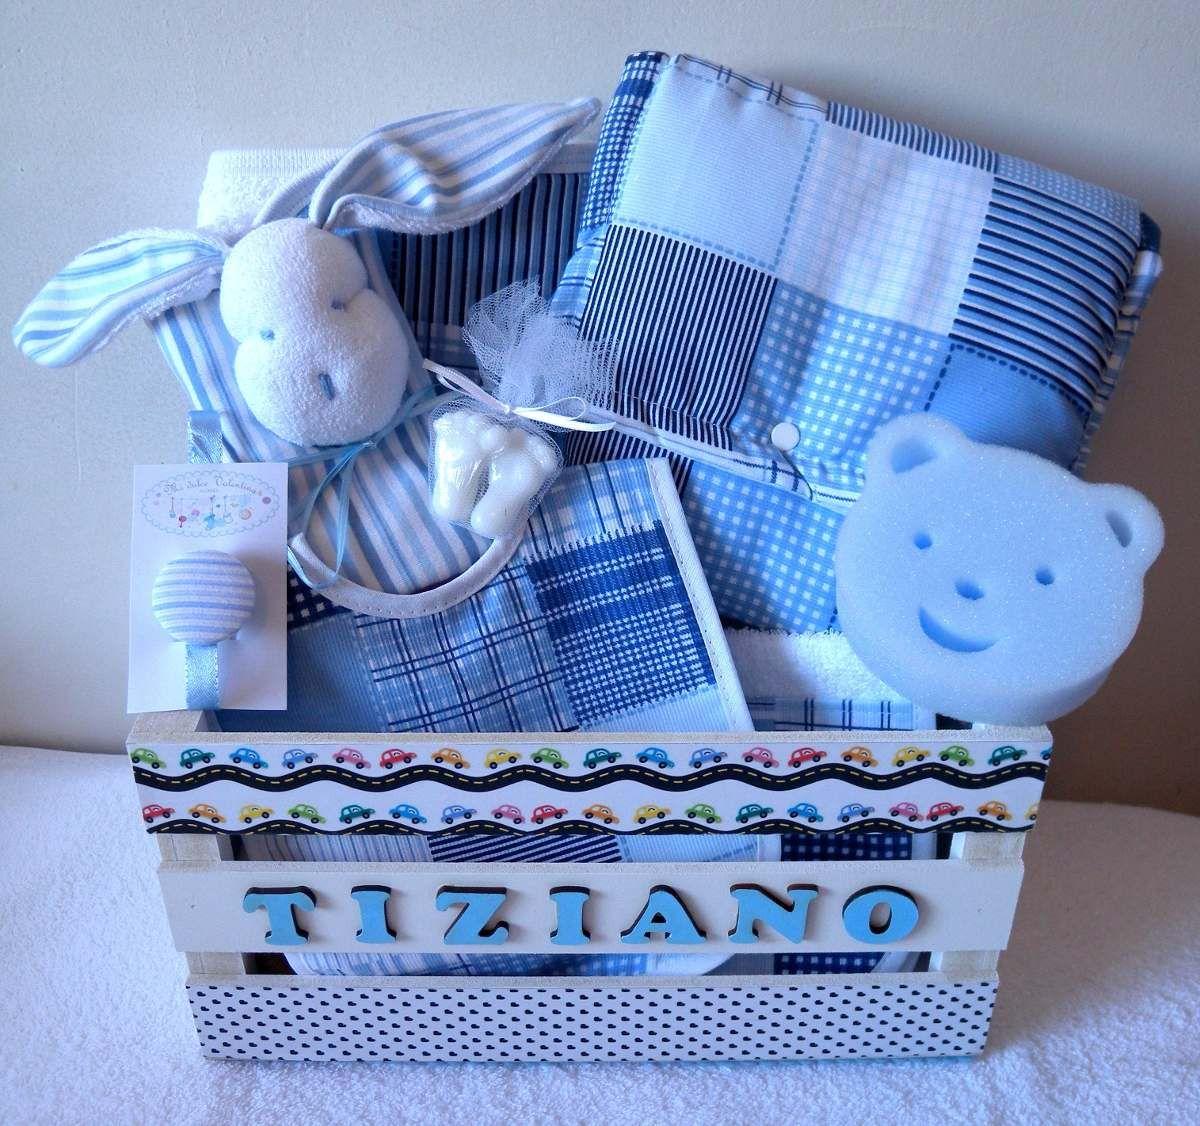 Ajuar bebe regalo toalla cambiador 8 productos personalizado bb toy ajuar bebe bebe y - Cambiador de bb ...